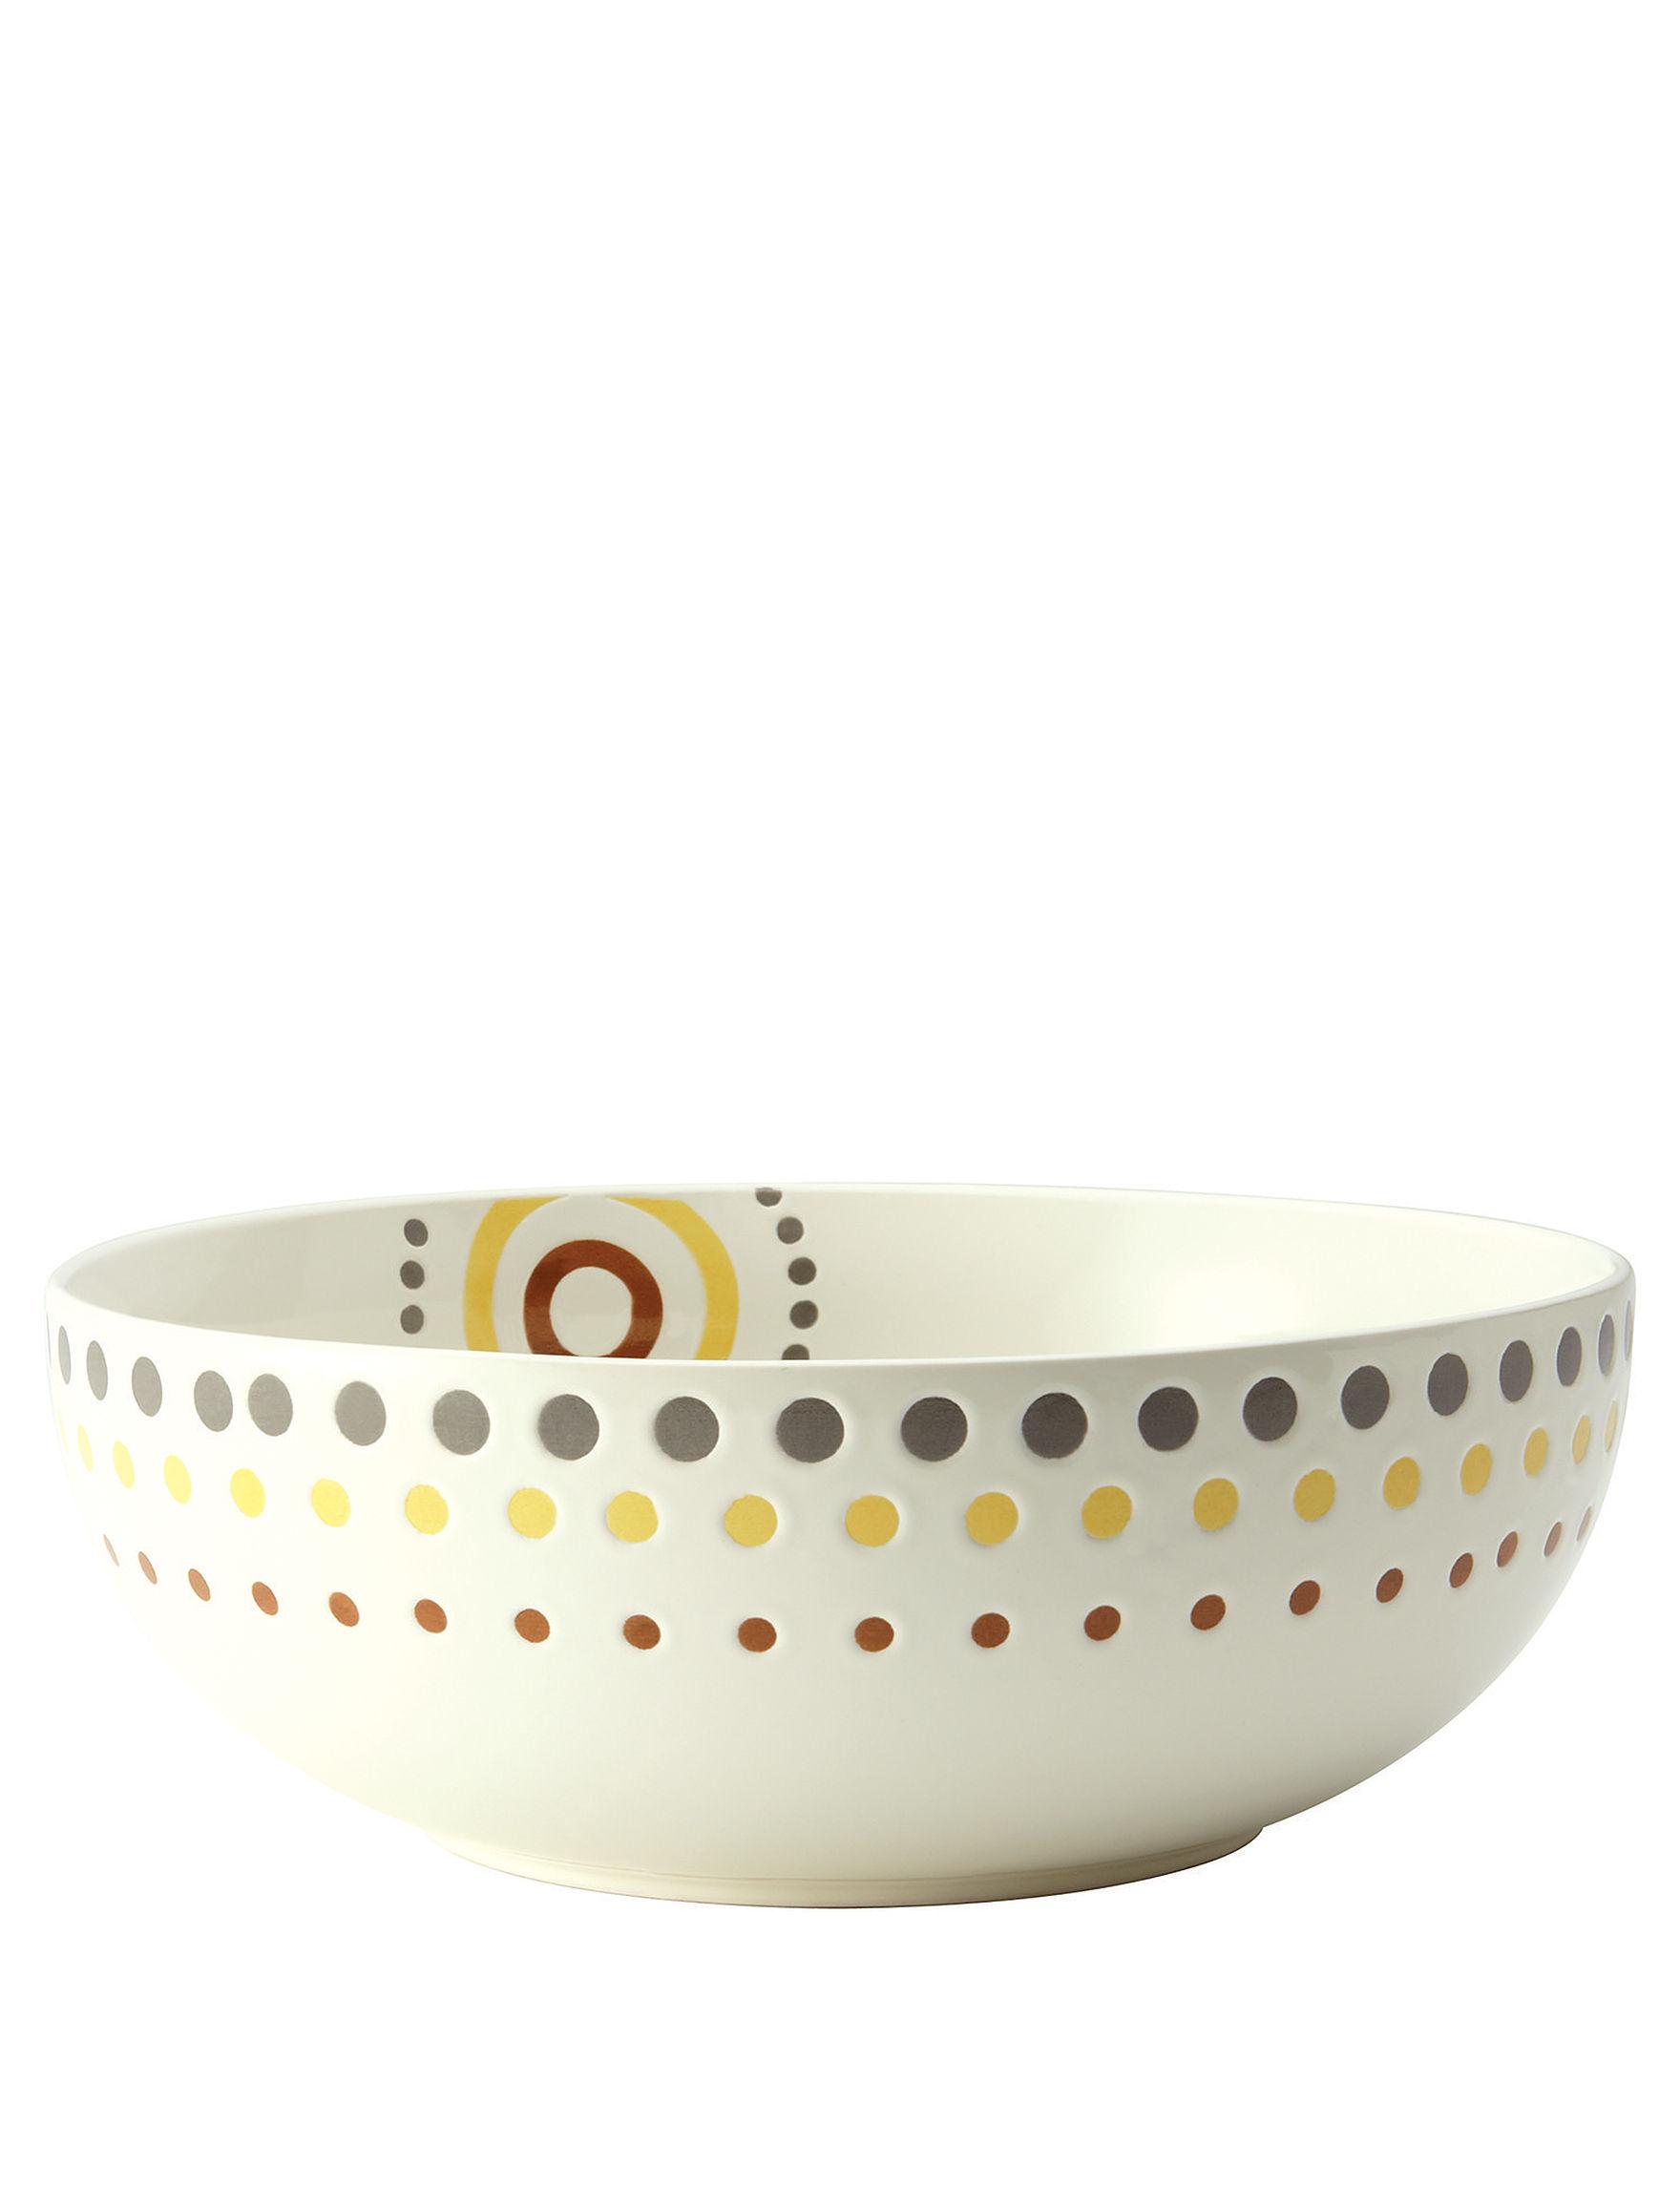 Rachael Ray White Serving Bowls Serveware